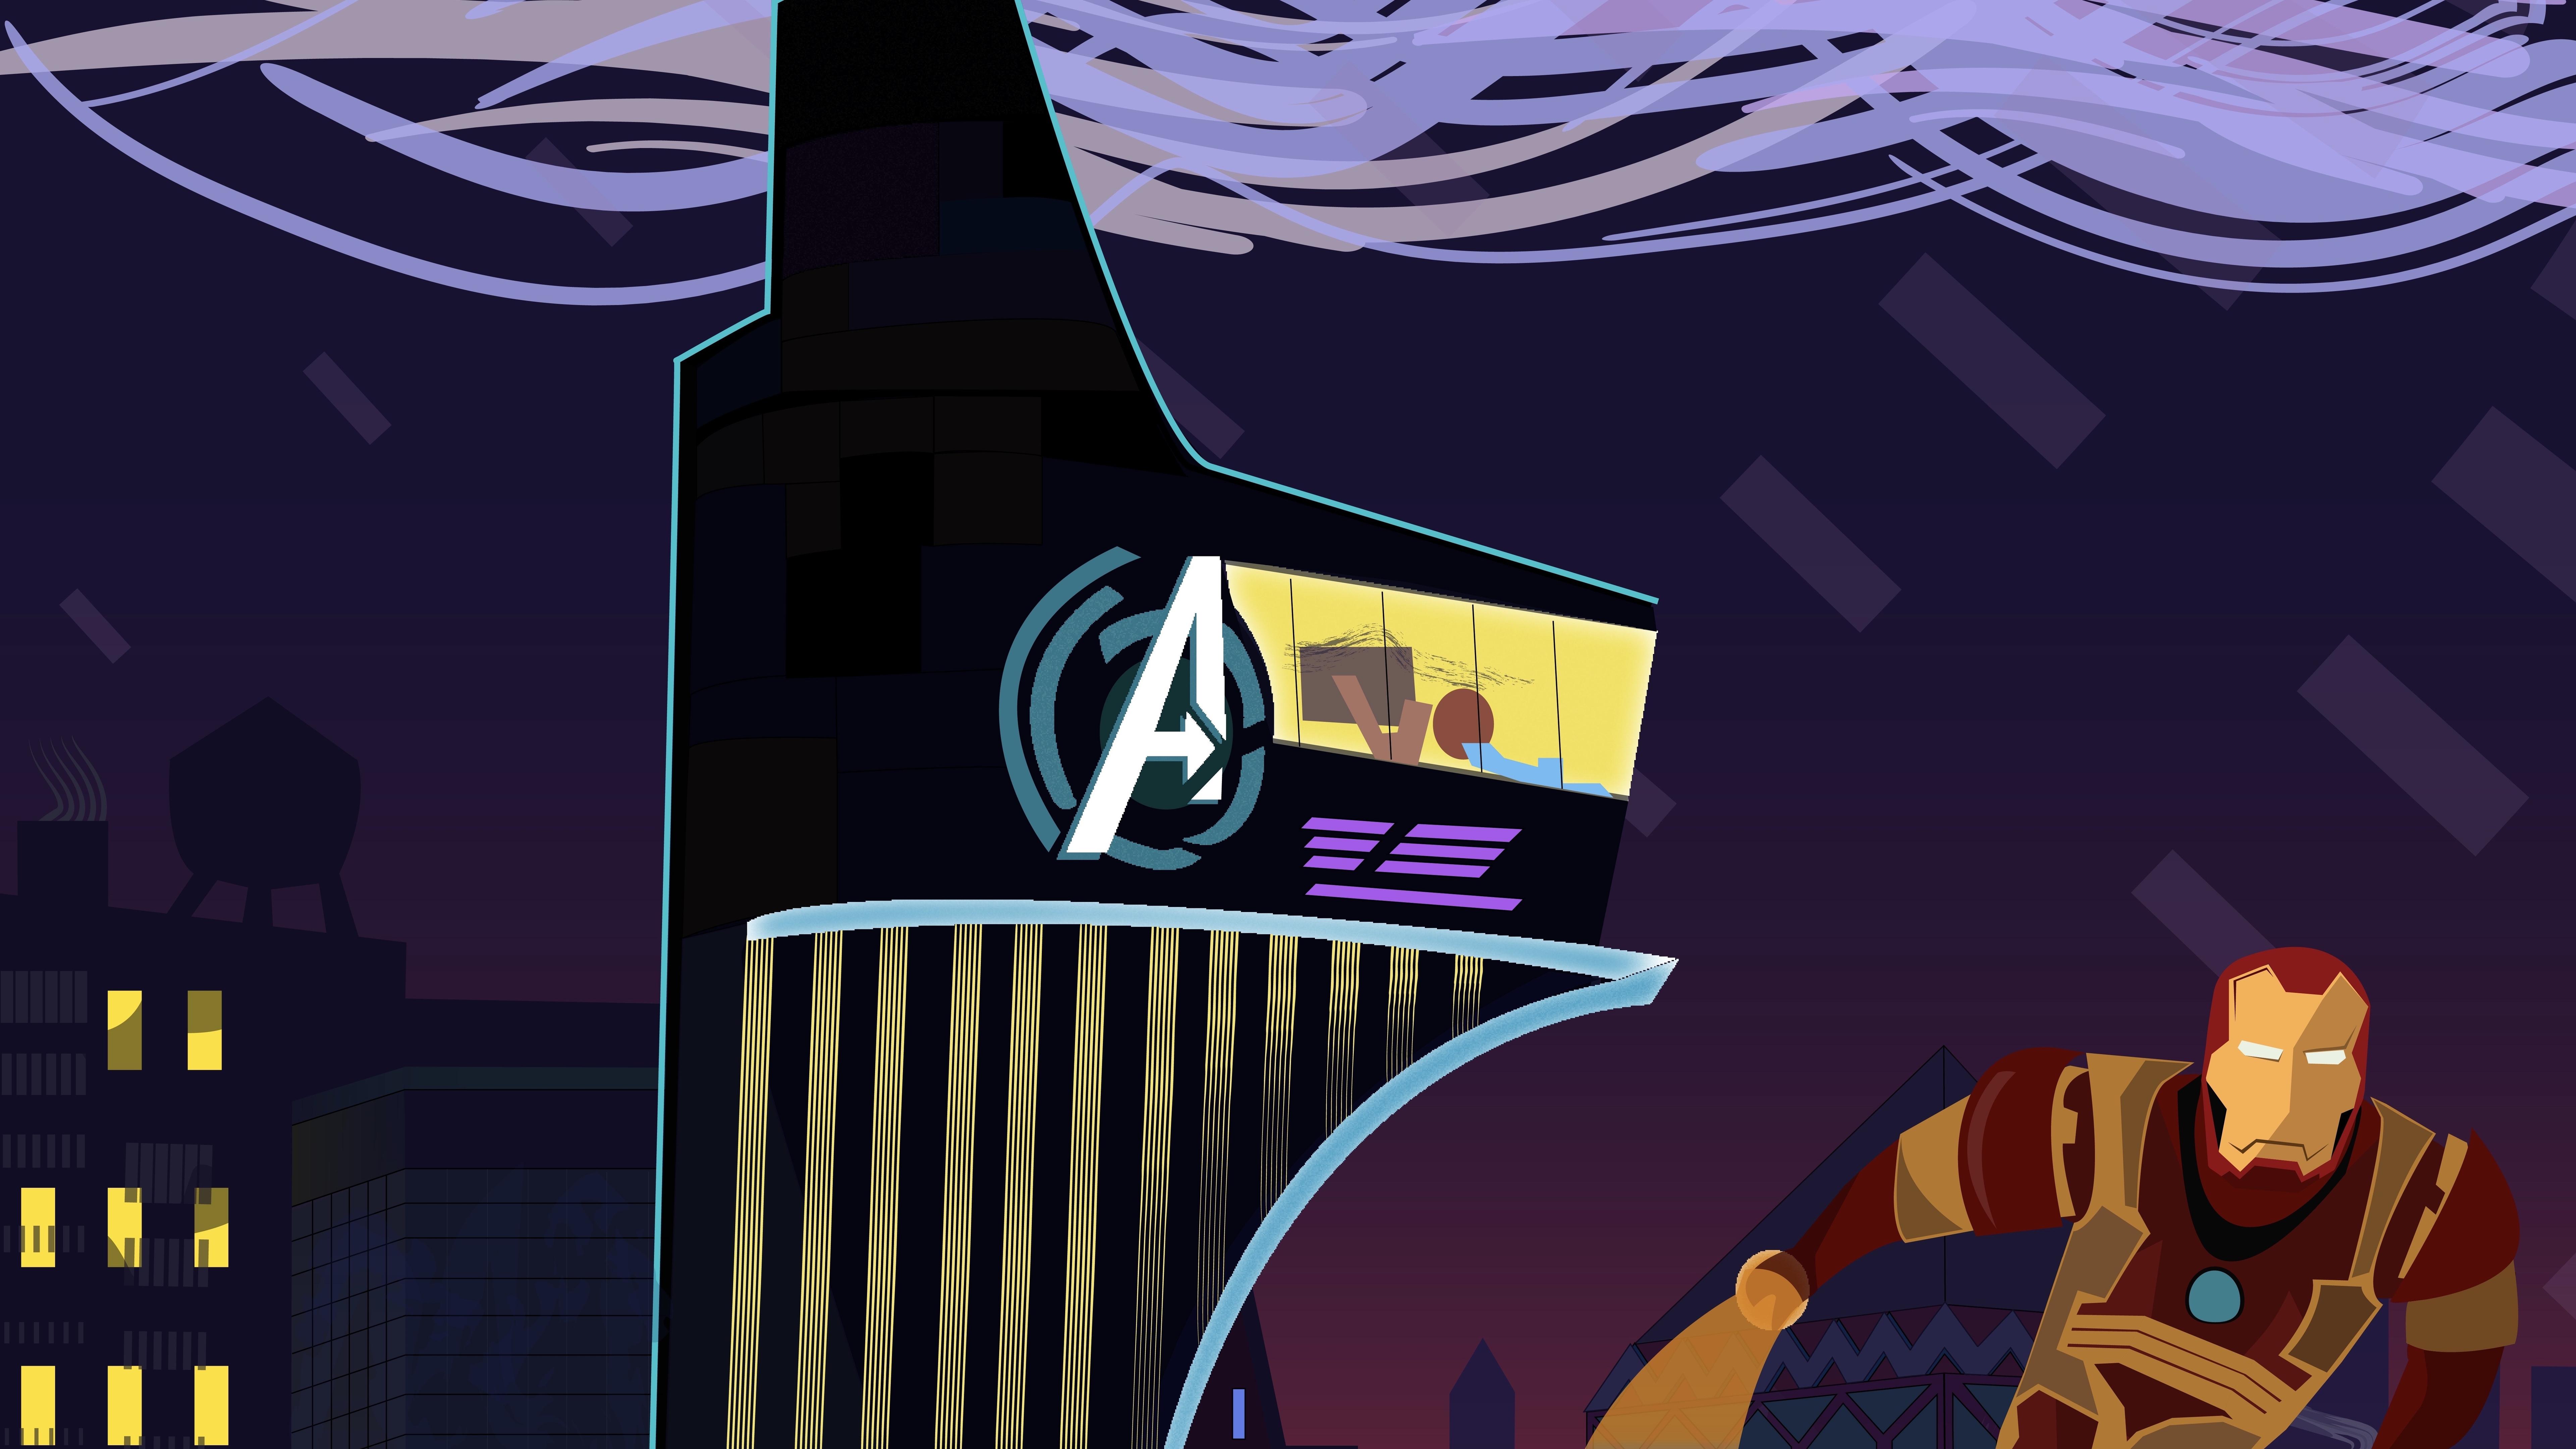 iron-man-into-the-spider-verse-1v.jpg